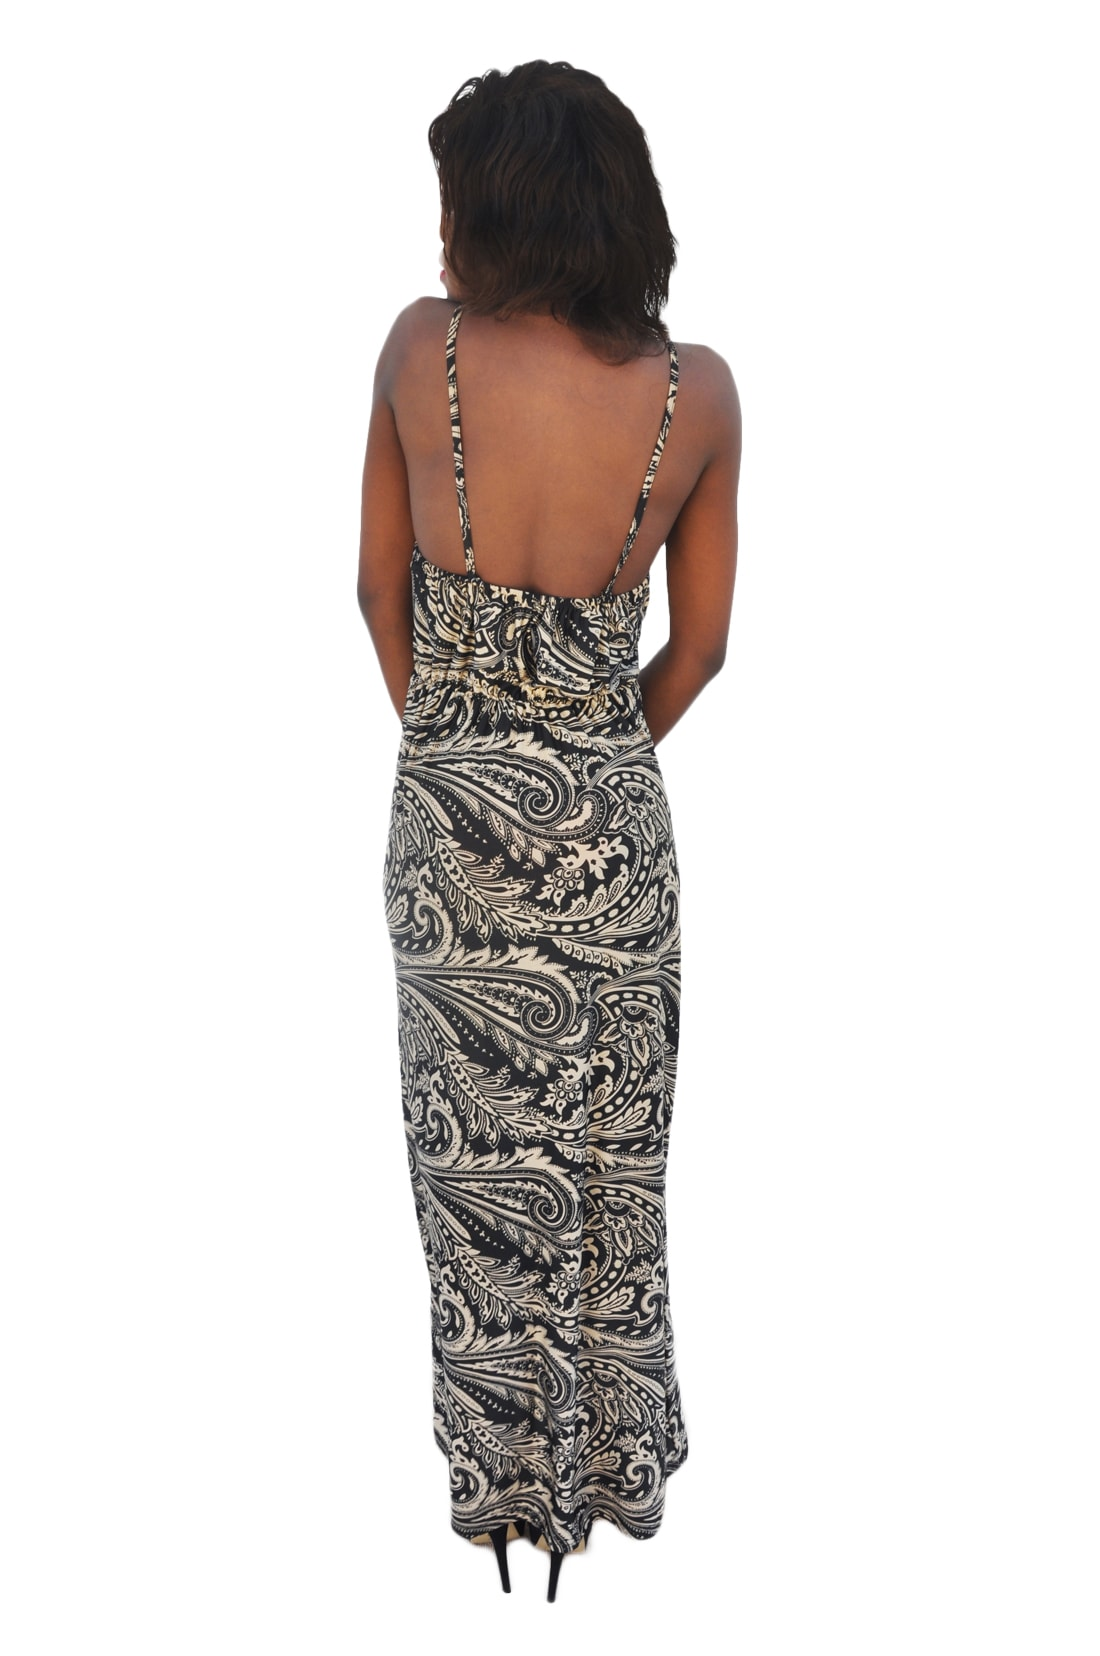 M0163 black2 Leisure Dresses maureens.com boutique